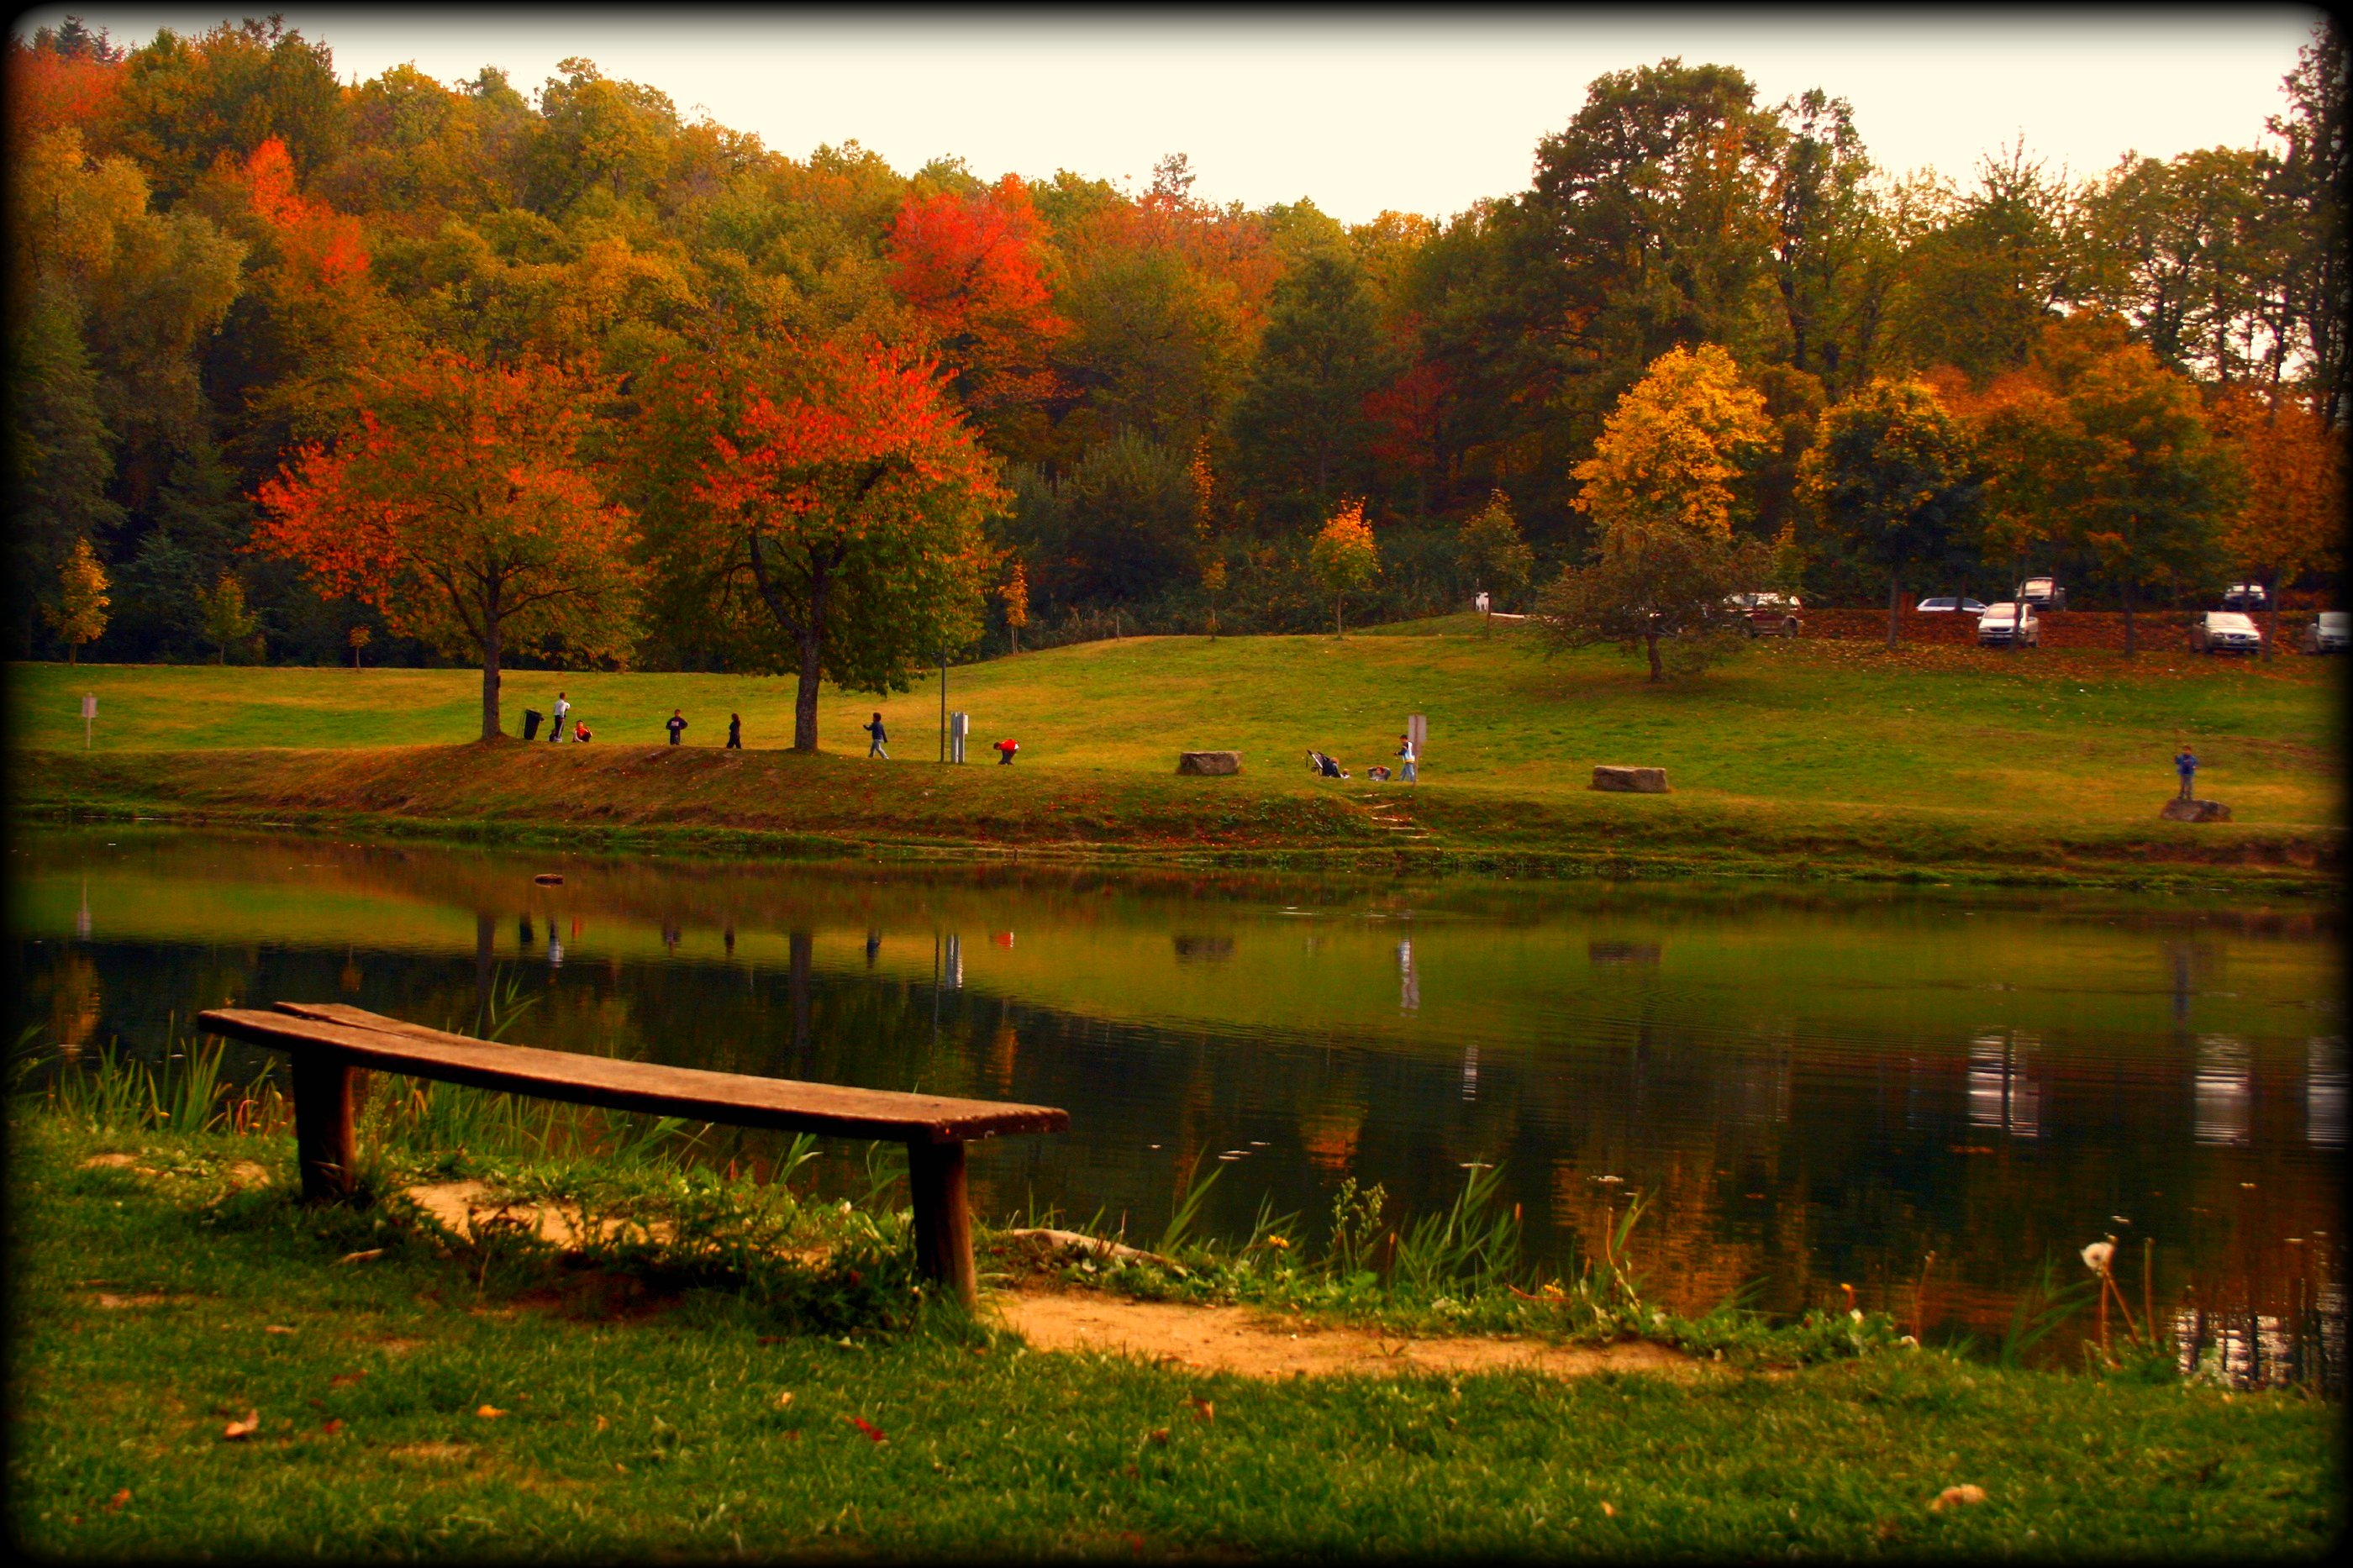 Autunno al lago flickr photo sharing - Lago pontini bagno di romagna ...